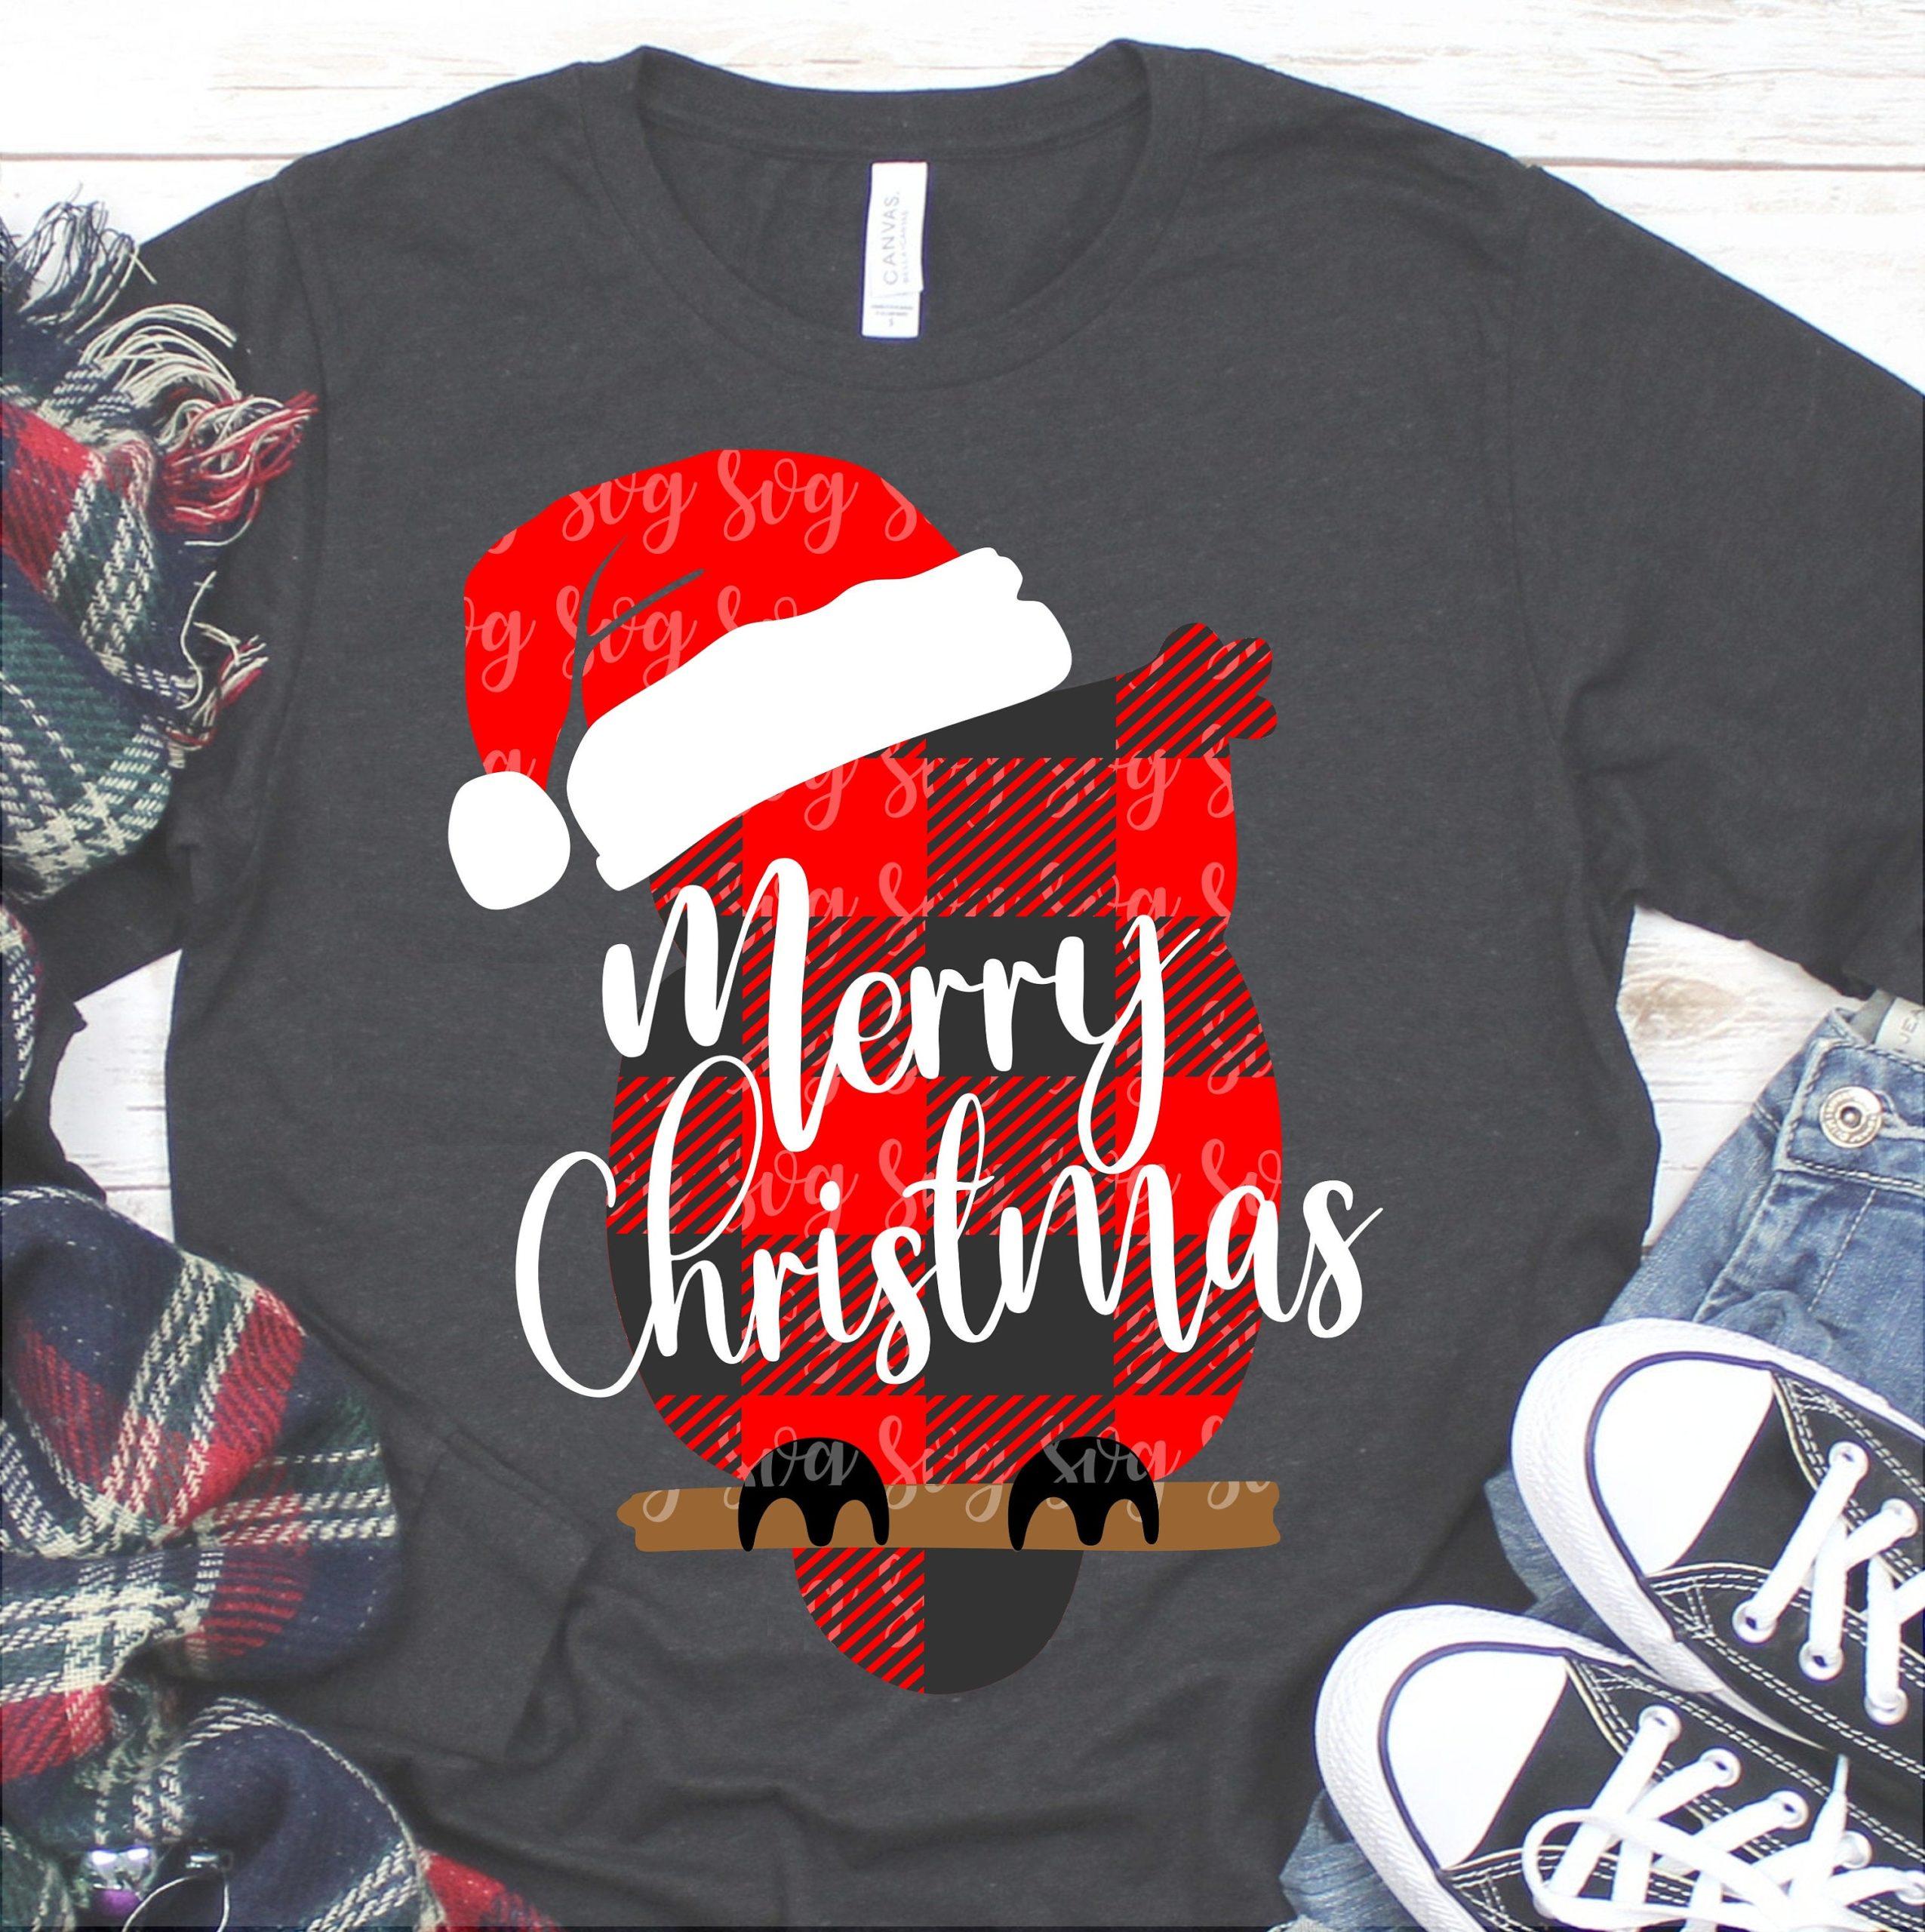 Plaid-owl-svg-christmas-owl-svg-christmas-night-svg-merry-christmas-svg-owl-svg-dxf-epsbuffalo-plaid-svgsvg-for-cricutchristmas-svg-5e221c0b